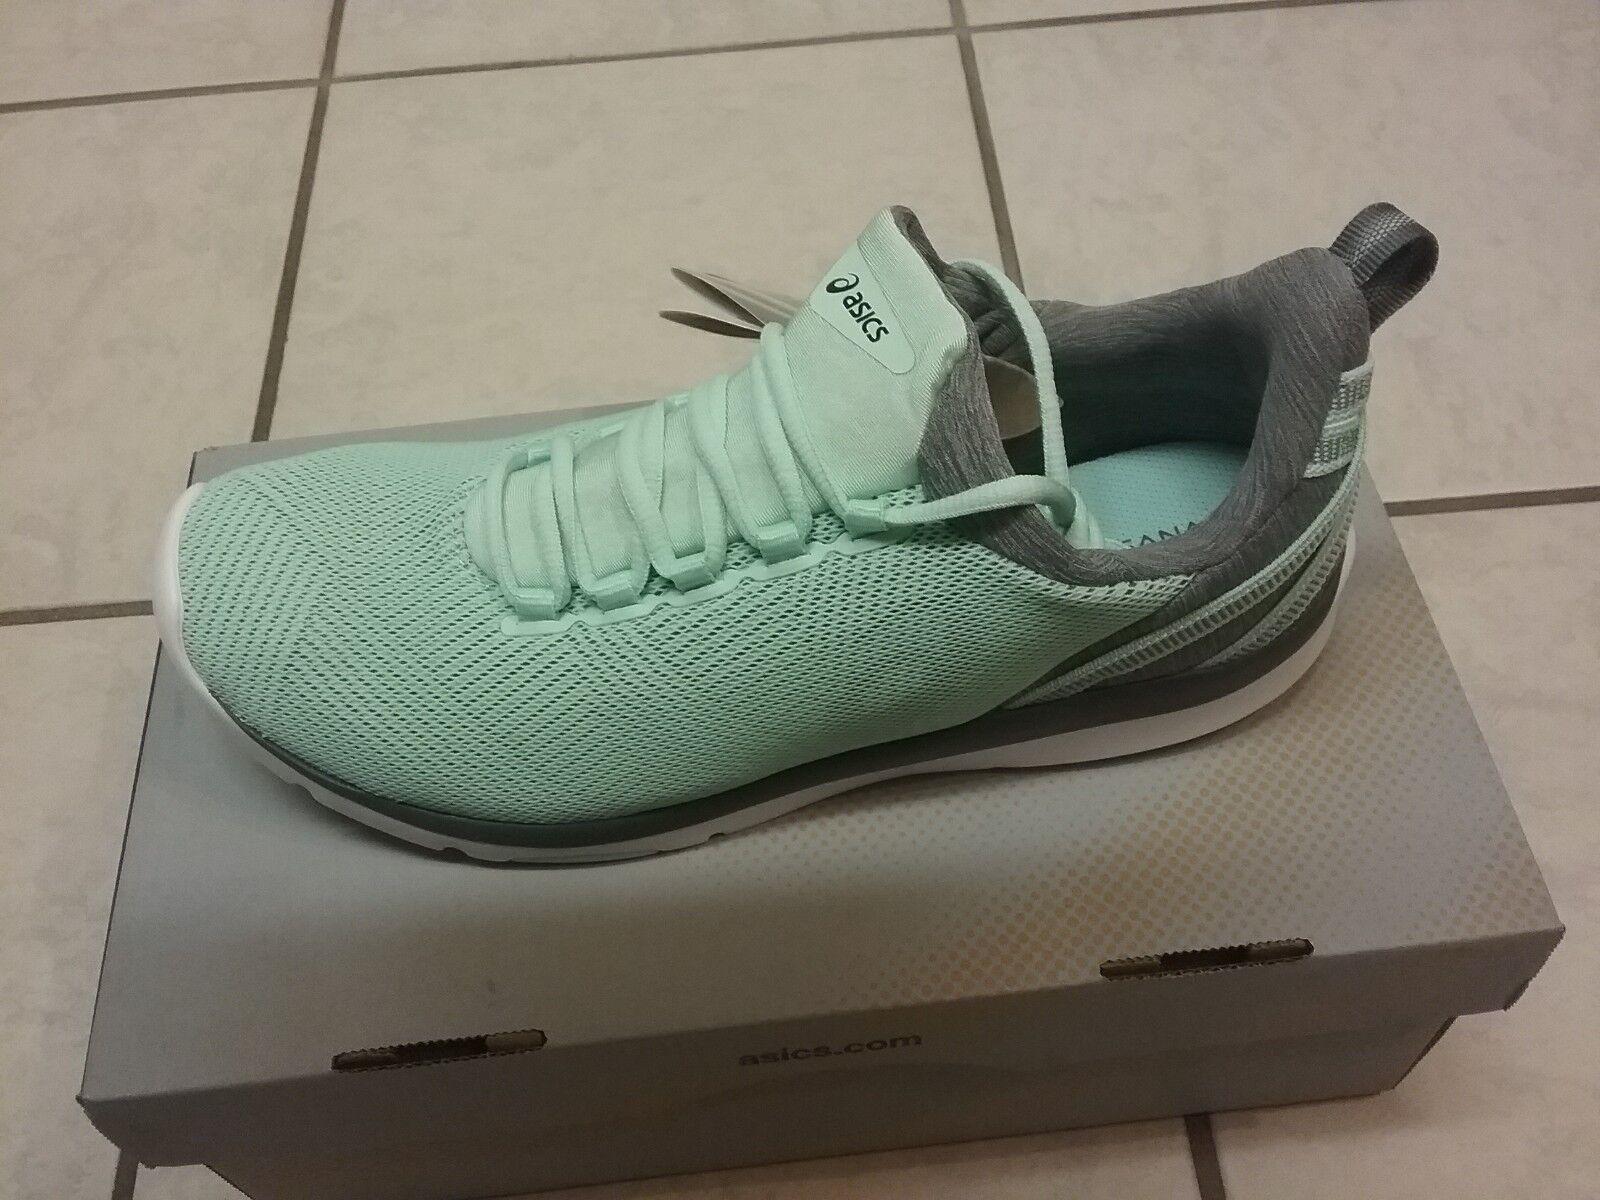 NEW ASICS Women's Gel-Fit Sana 3 Cross-Trainer Cross-Trainer Cross-Trainer shoes 8790 Bay Black Carbon size 9 b651ad